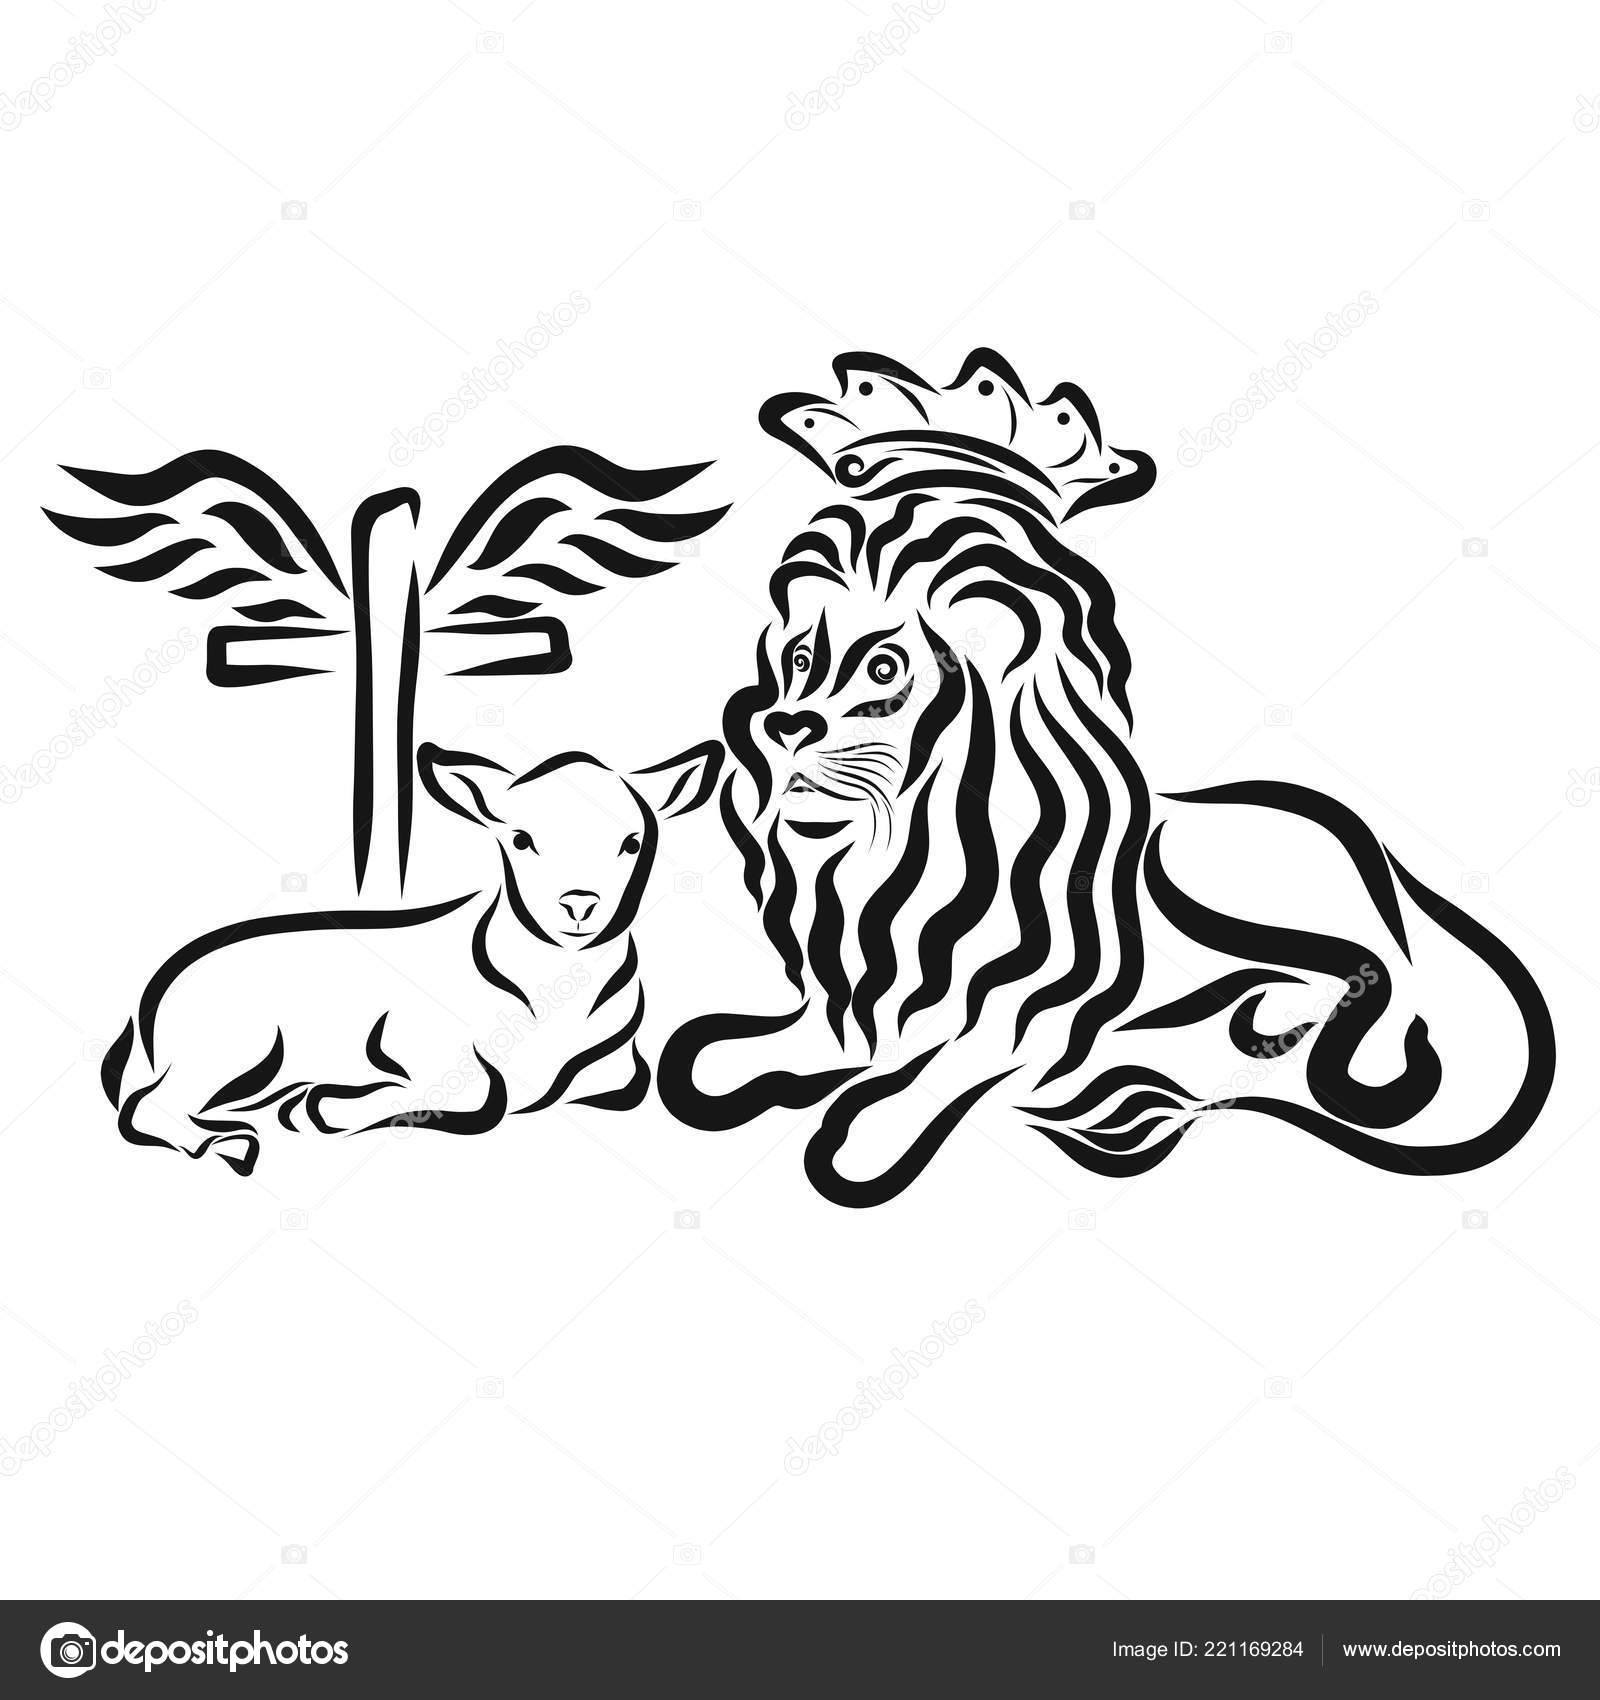 Humble Lamb Lion King Cross Wings Sacrifice Victory Stock Photo